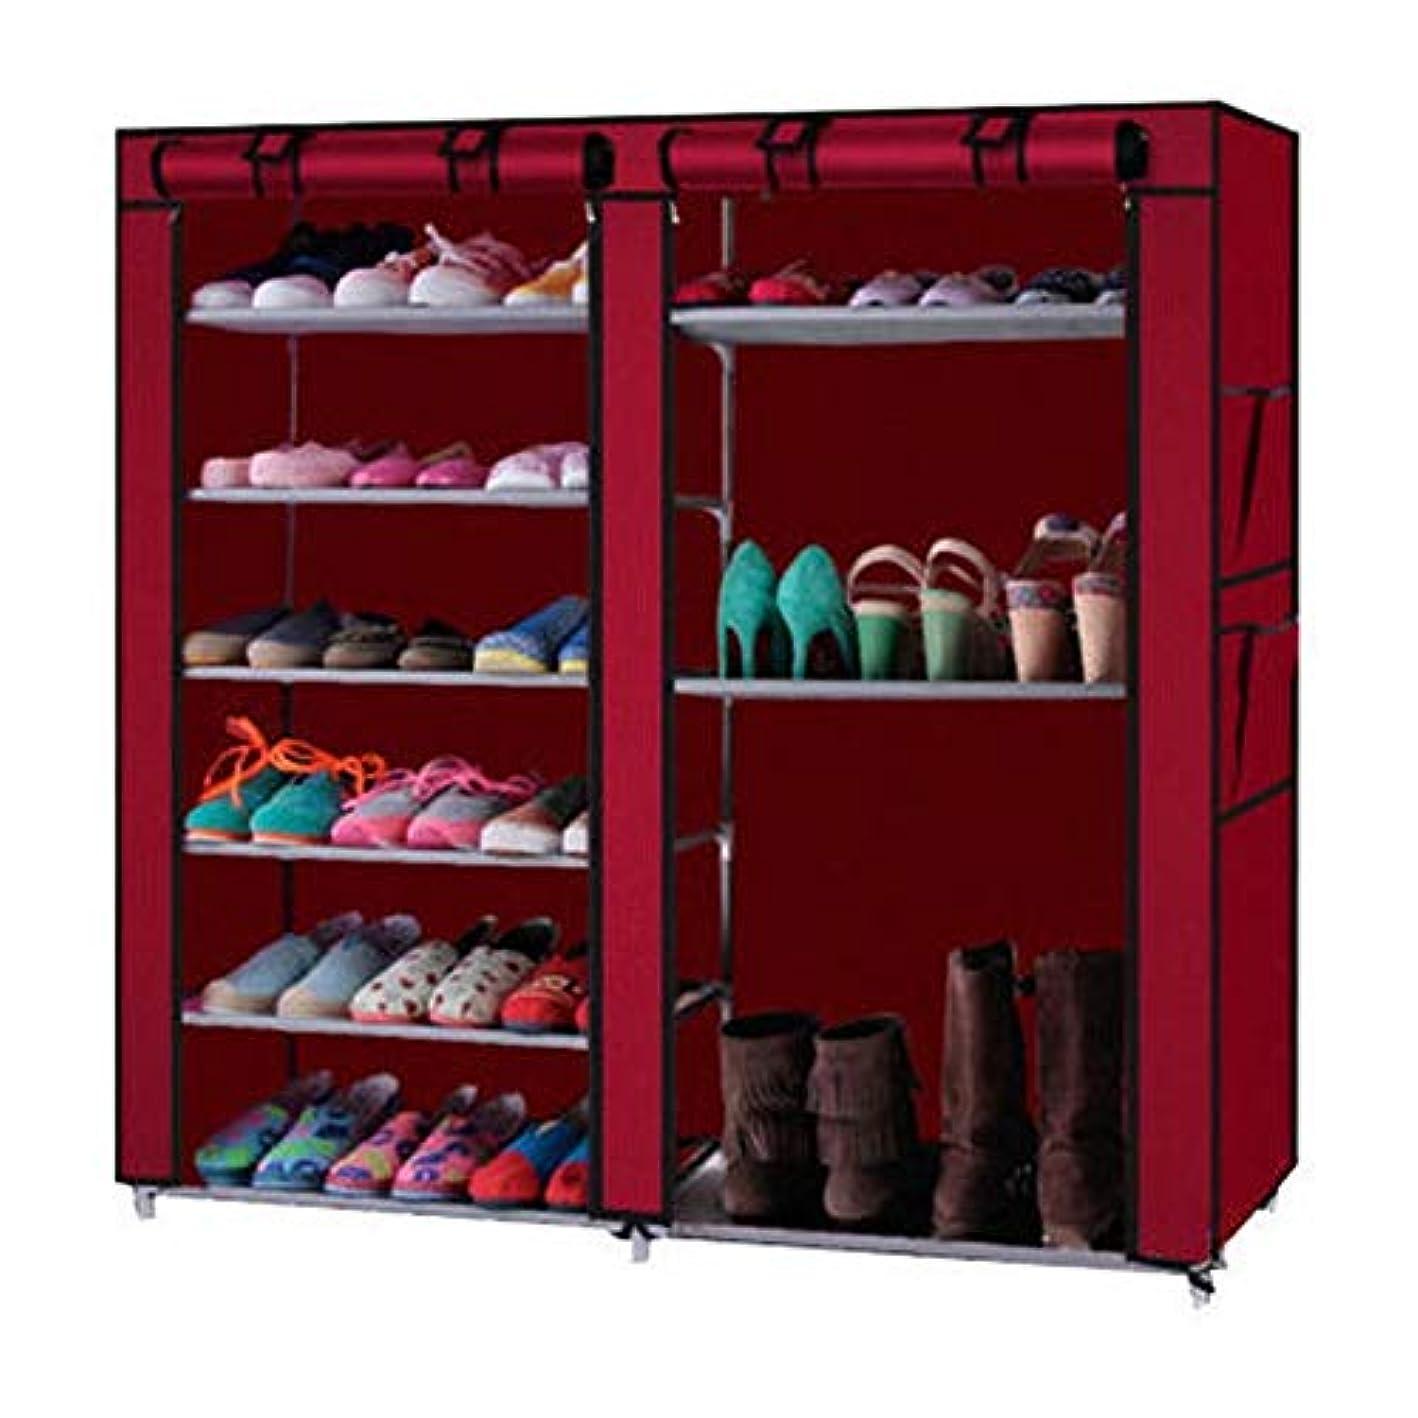 YANEE Shoe Rack Shelf Home Fabric, PE Plastic Storage Organizer Cabinet 6 Layer 12 Grid Close with Cover